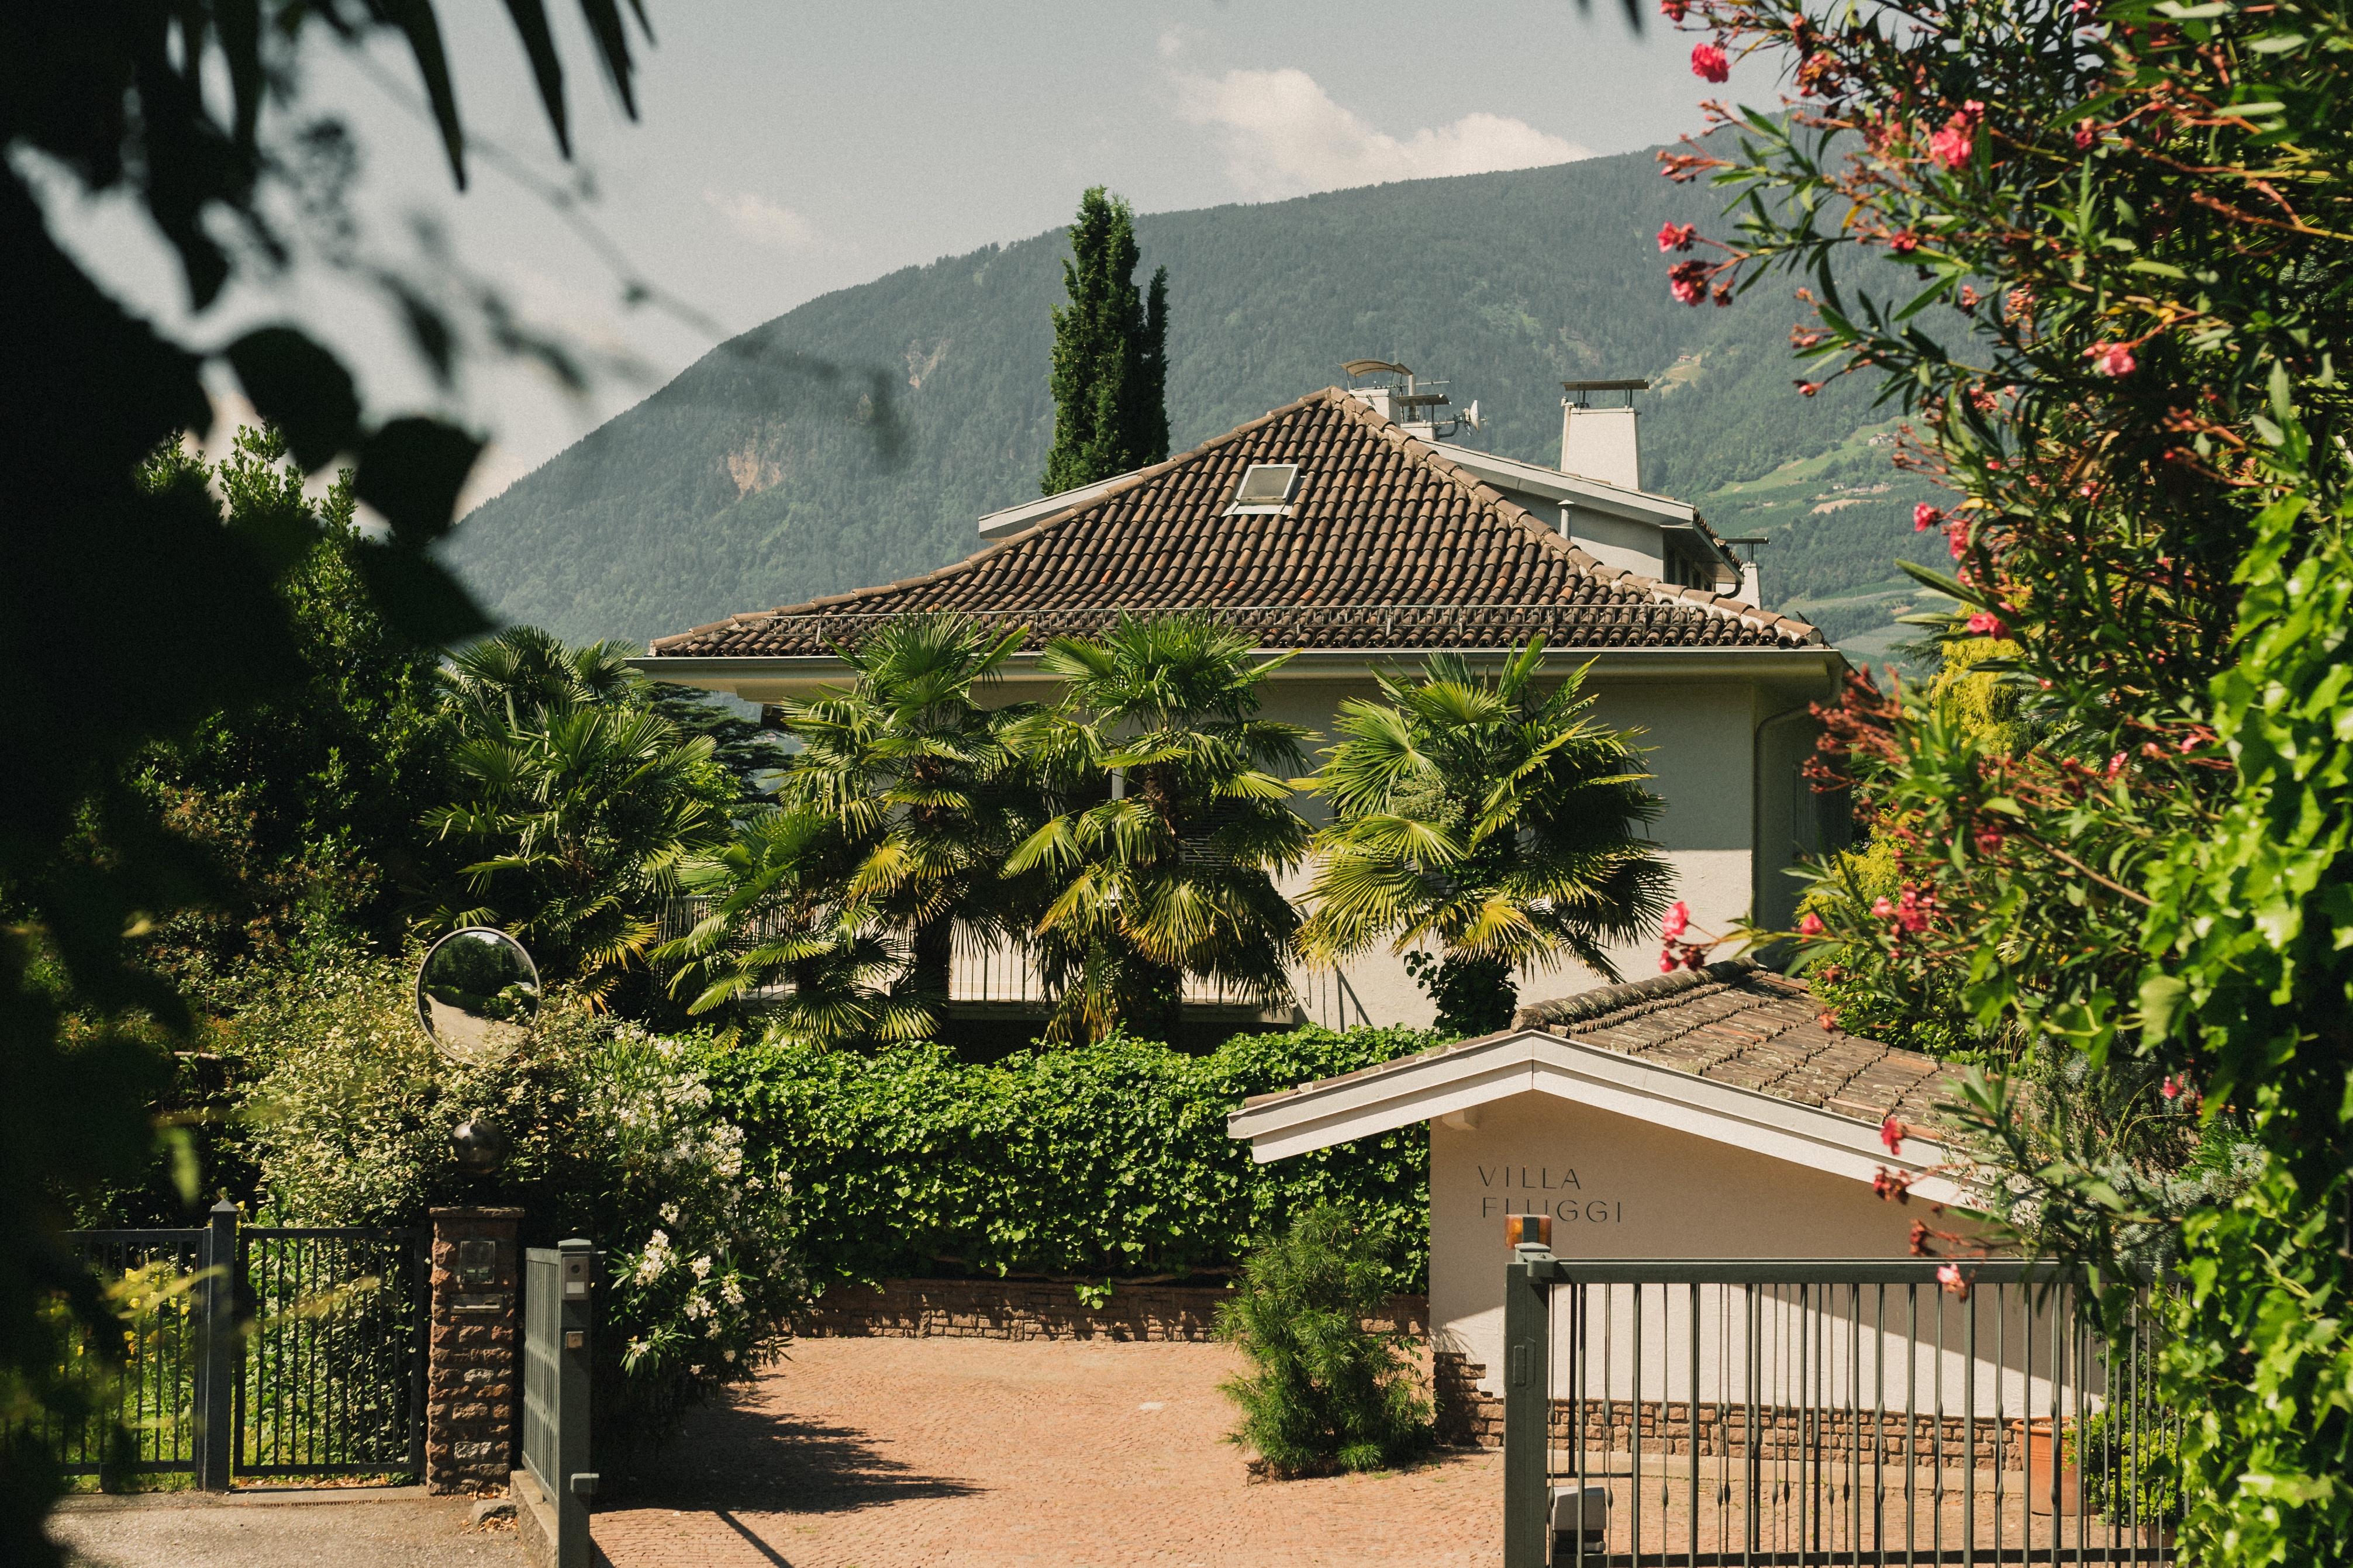 Villa Fluggi 178 (Urlaub im Denkmal)